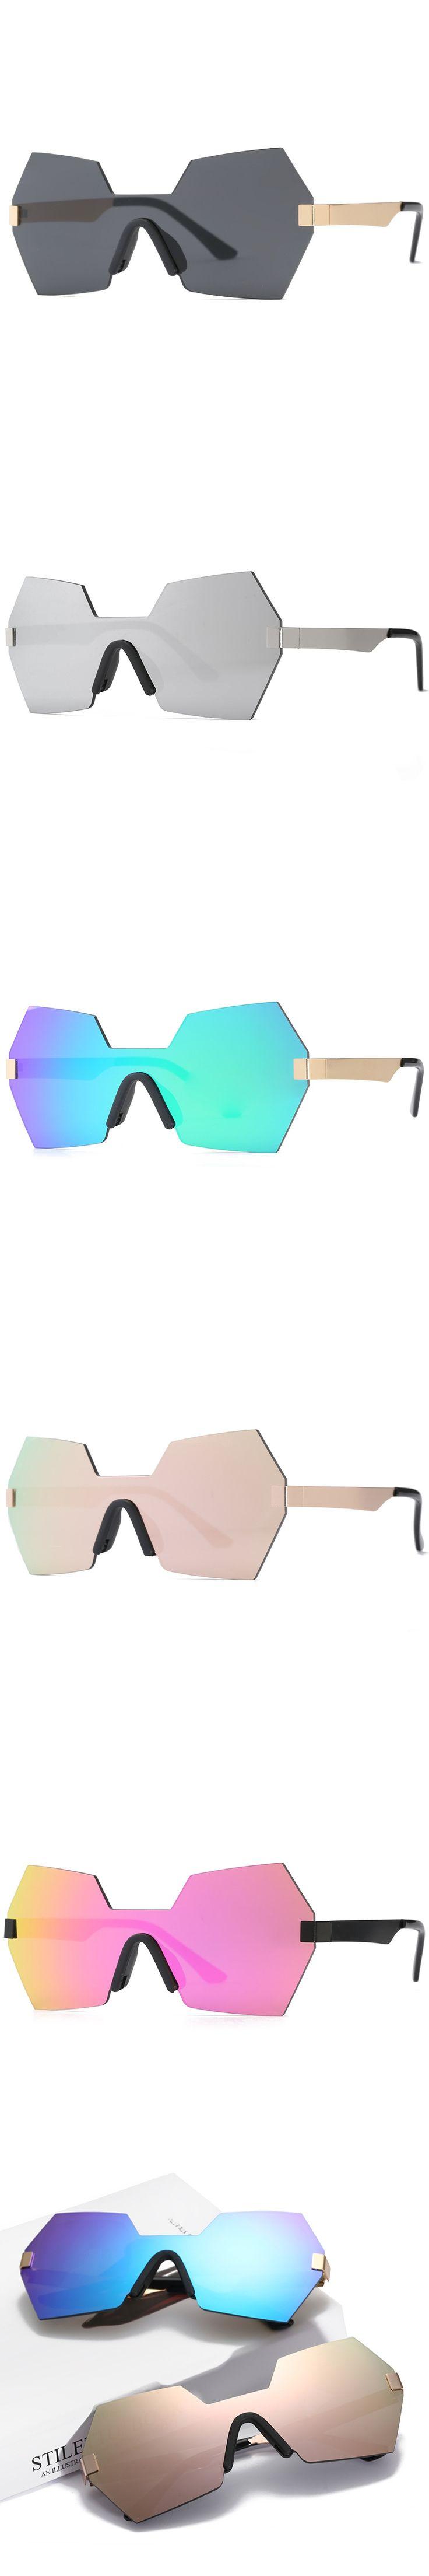 New 2017 Brand Design Vintage Polygon Metal Frame Goggles Sunglasses Men/women Driving Travel Eyewear Lunette De Soleil Femme